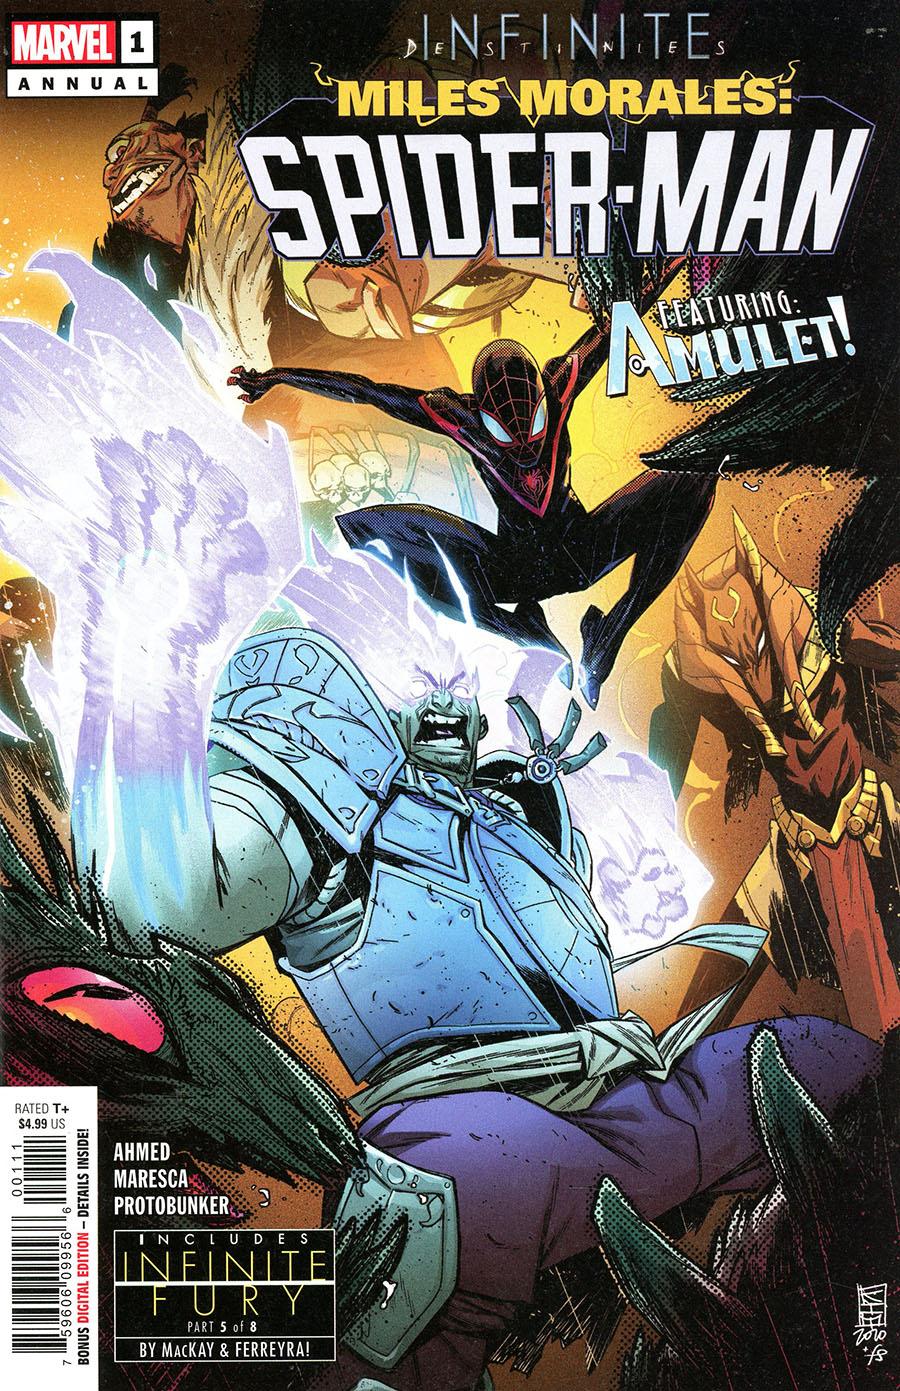 Miles Morales Spider-Man Annual #1 Cover A Regular Kim Jacinto Cover (Infinite Destinies Tie-In)